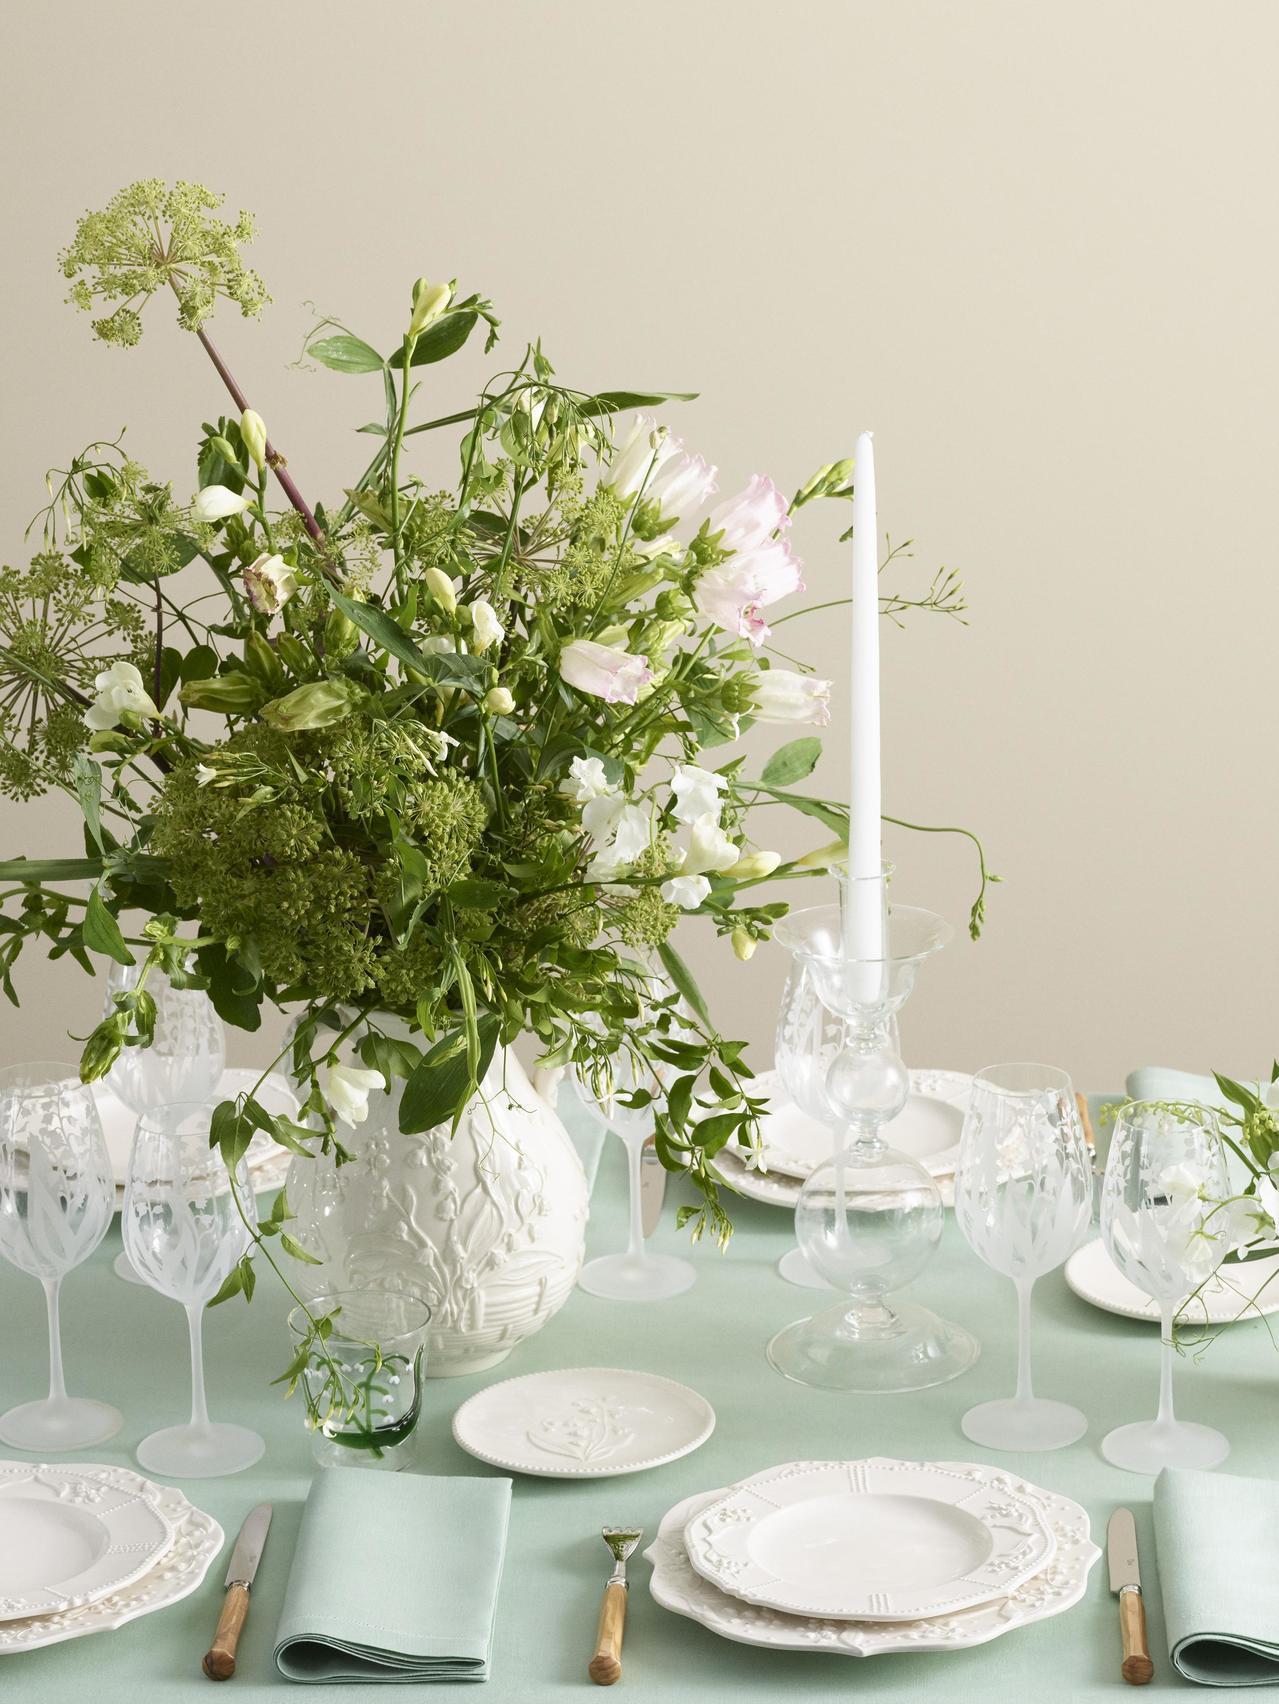 DIOR Maison鈴蘭花系列也是恬淡薄荷綠。圖/DIOR提供